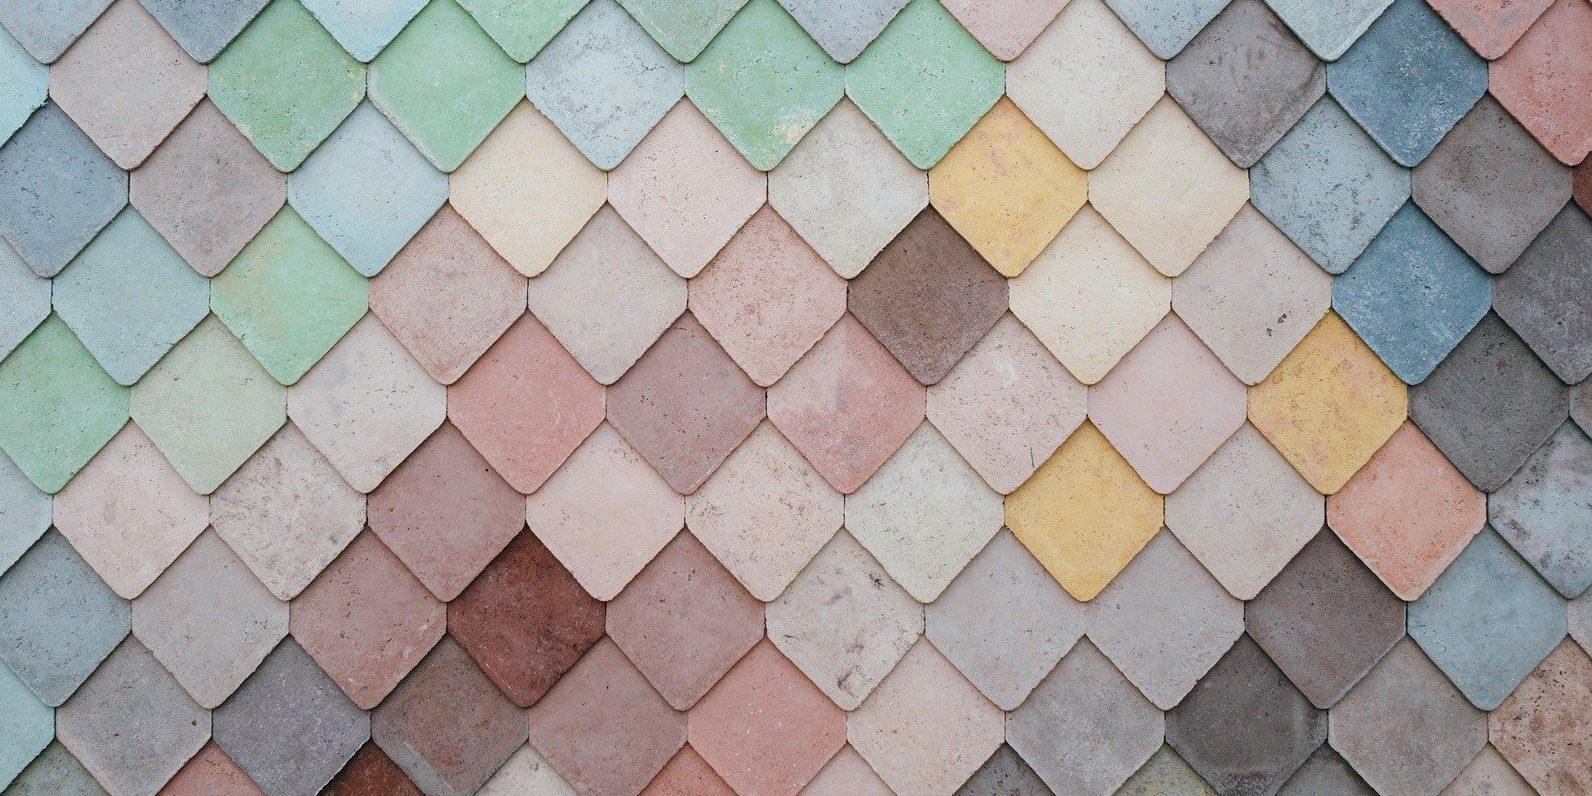 tiles-shapes-2617112_1920